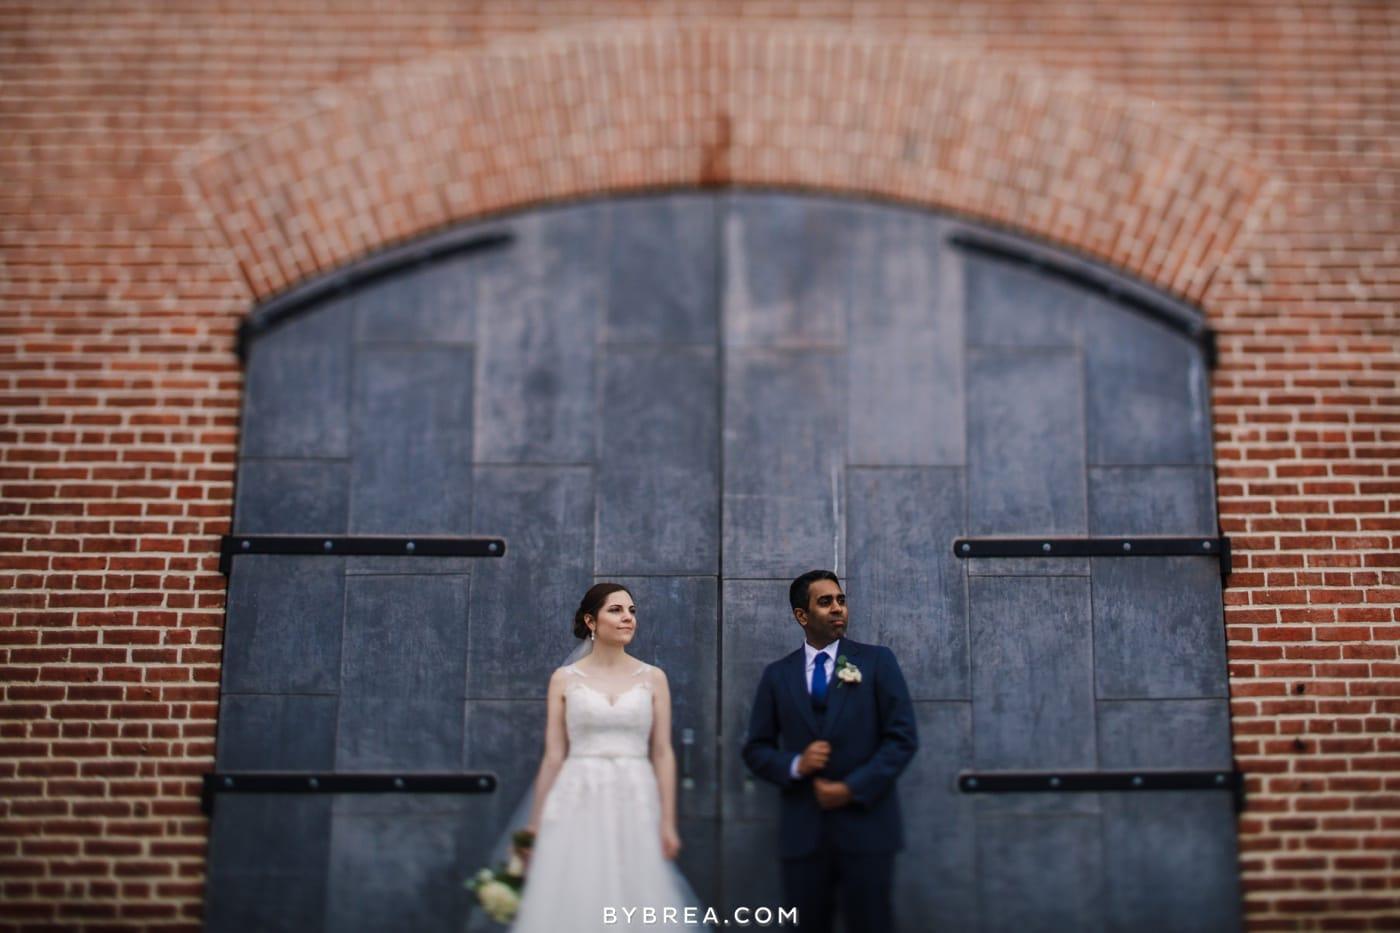 tracy-bharath-frederick-douglass-baltimore-wedding-photos_0282